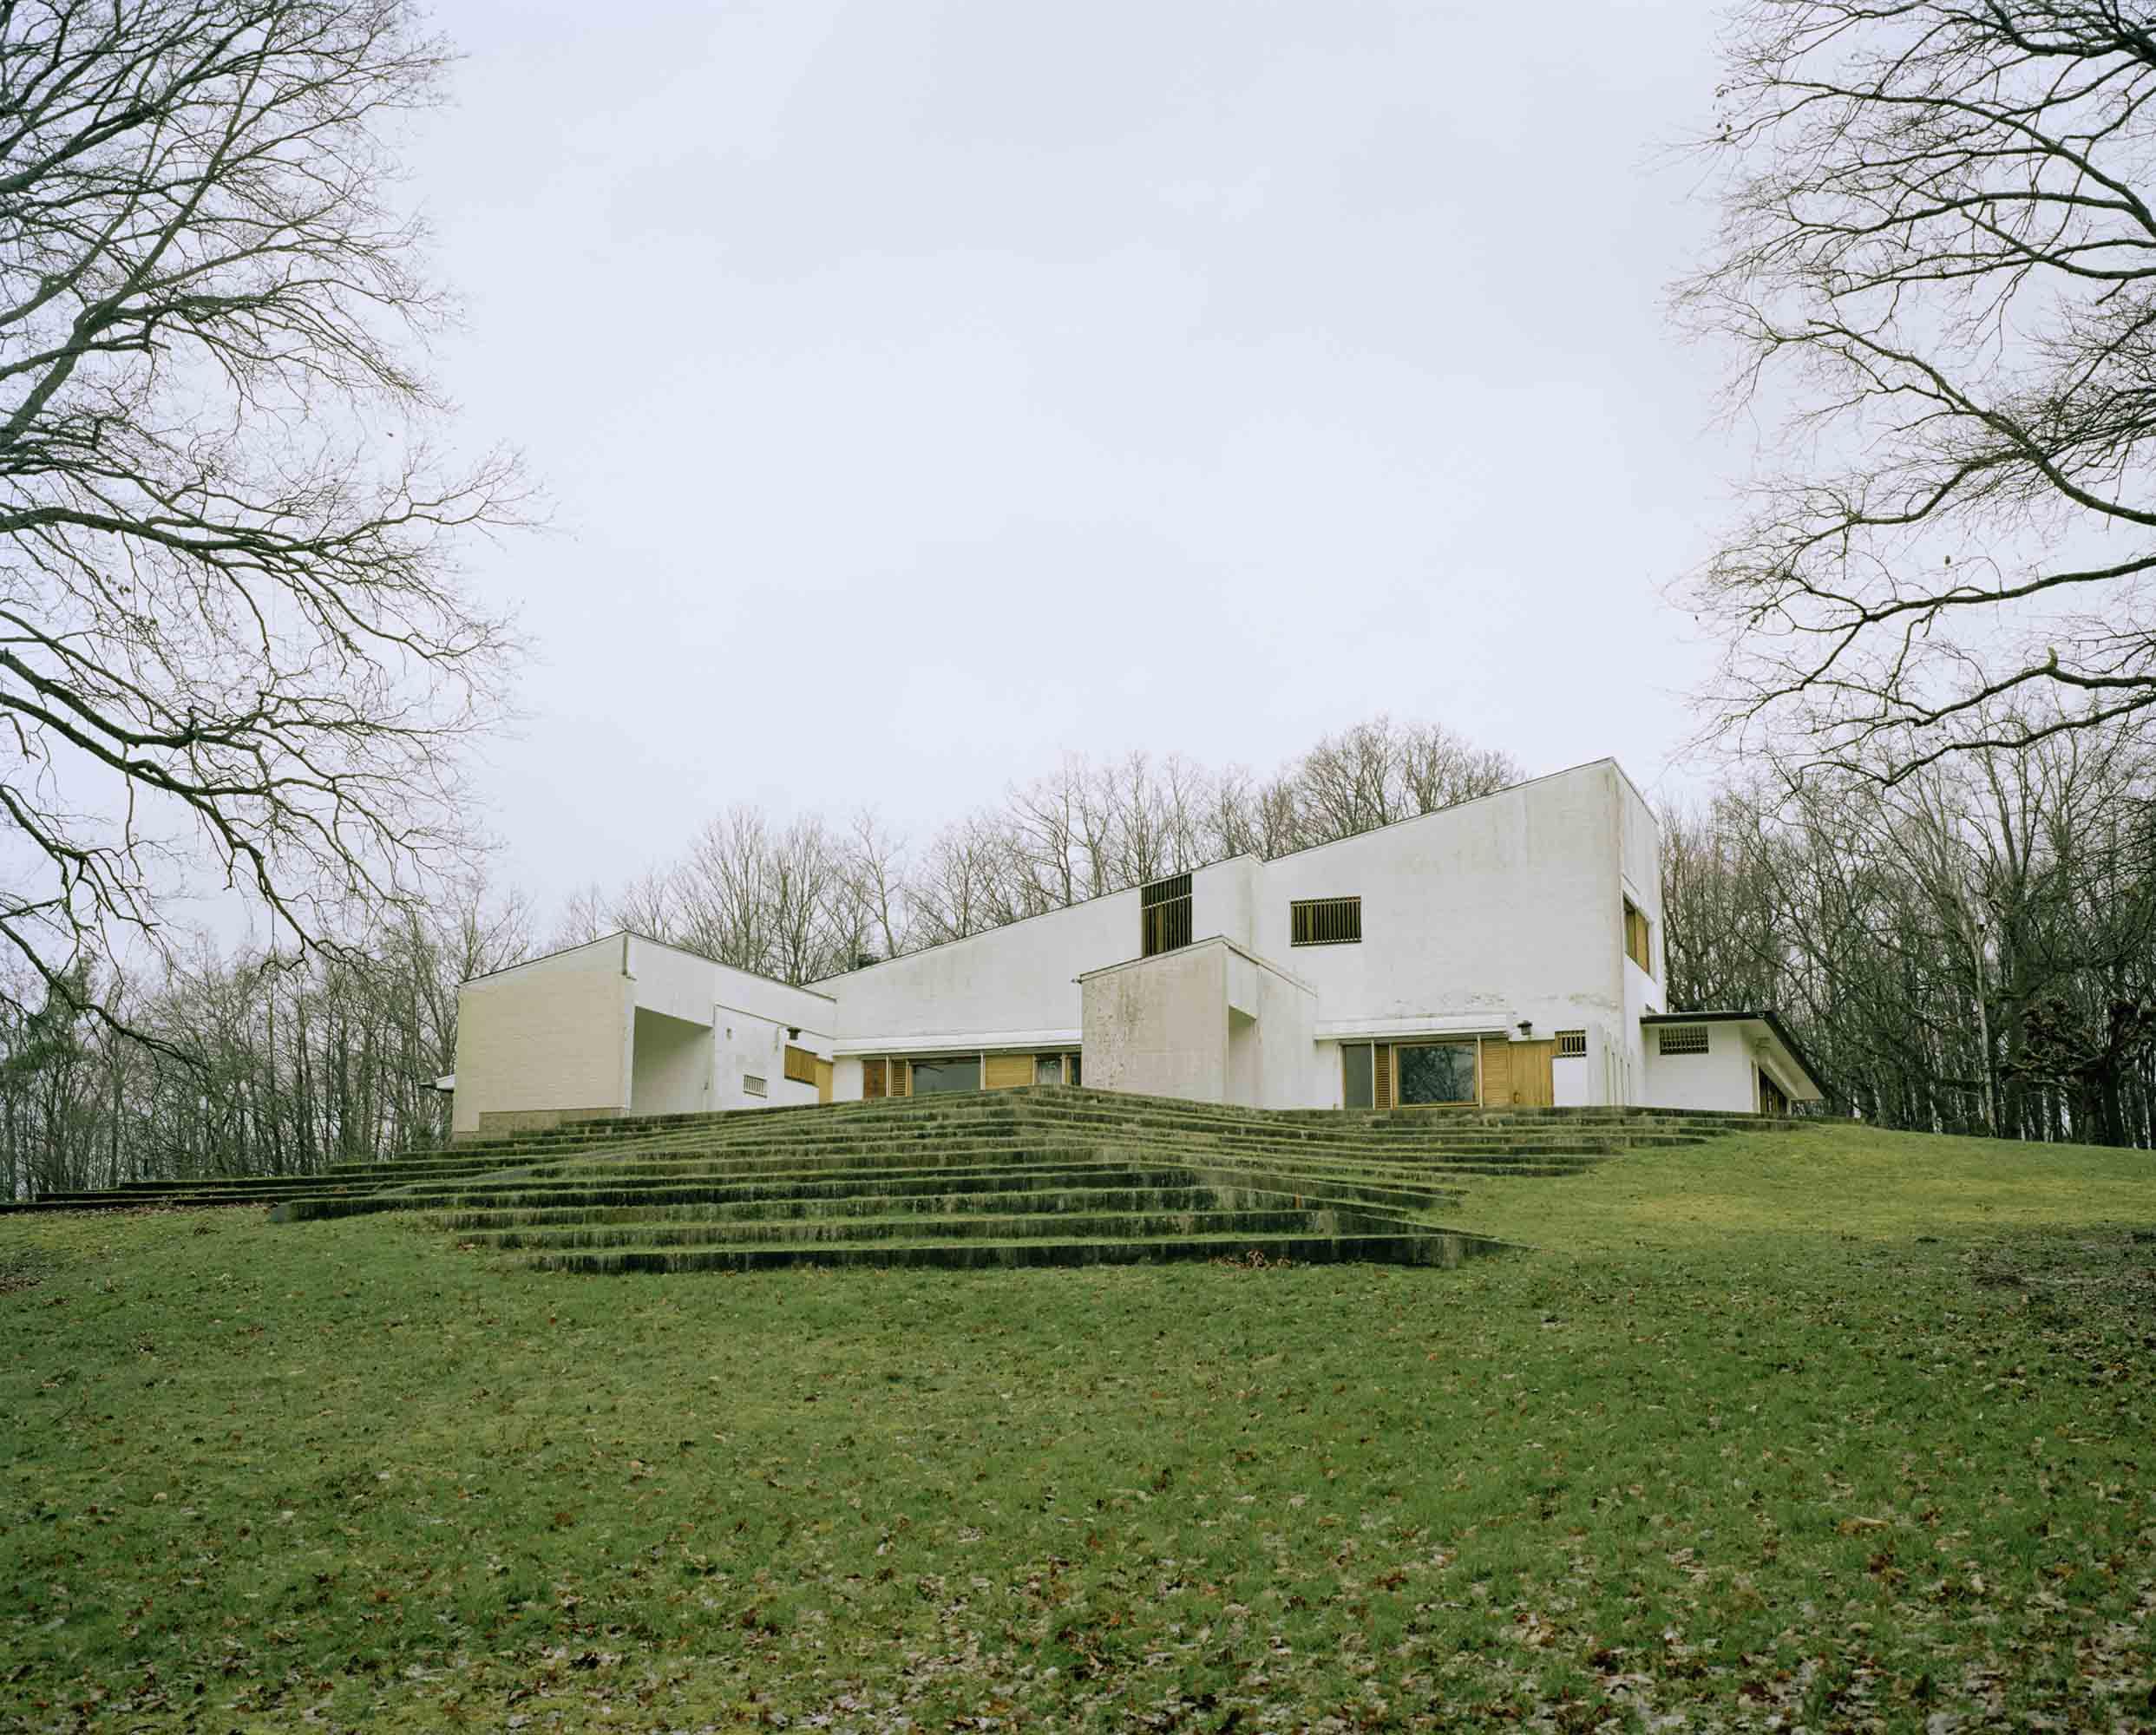 Armin Linke, Maison Louis Carré ©Armin Linke, VG Bild-Kunst, Bonn, 2014